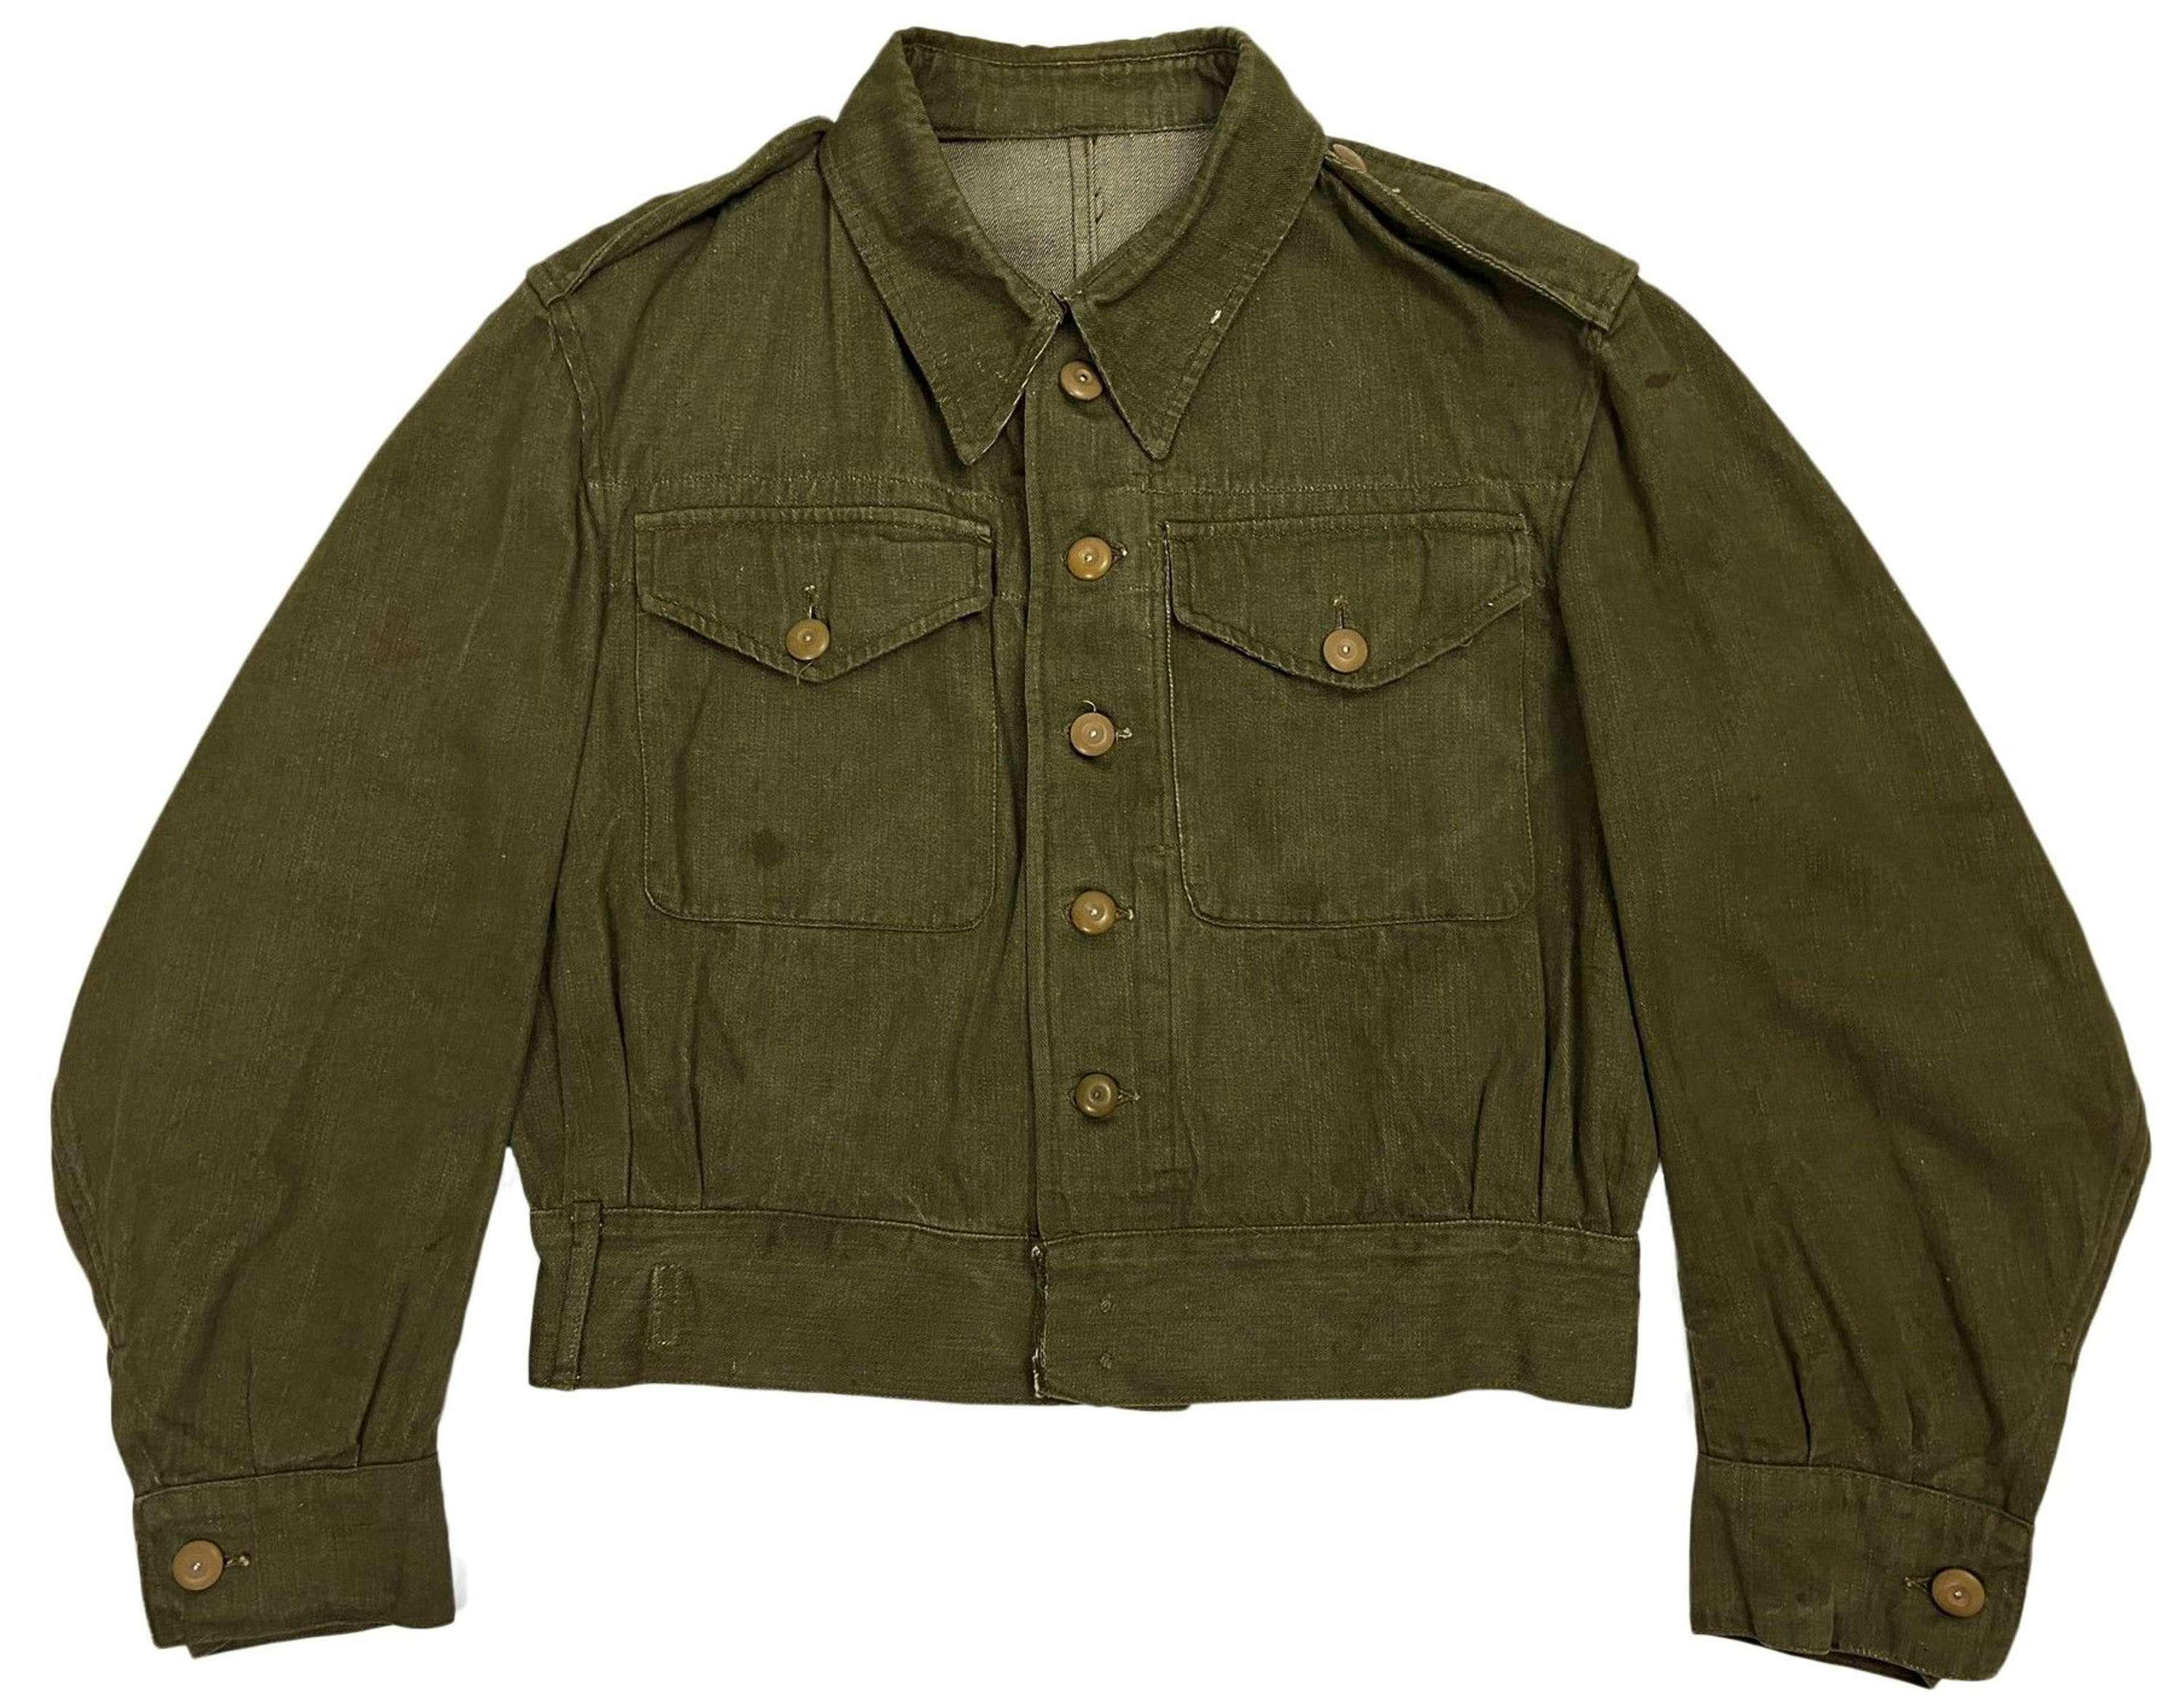 Original 1950s British Denim Battledress Blouse - Size 8